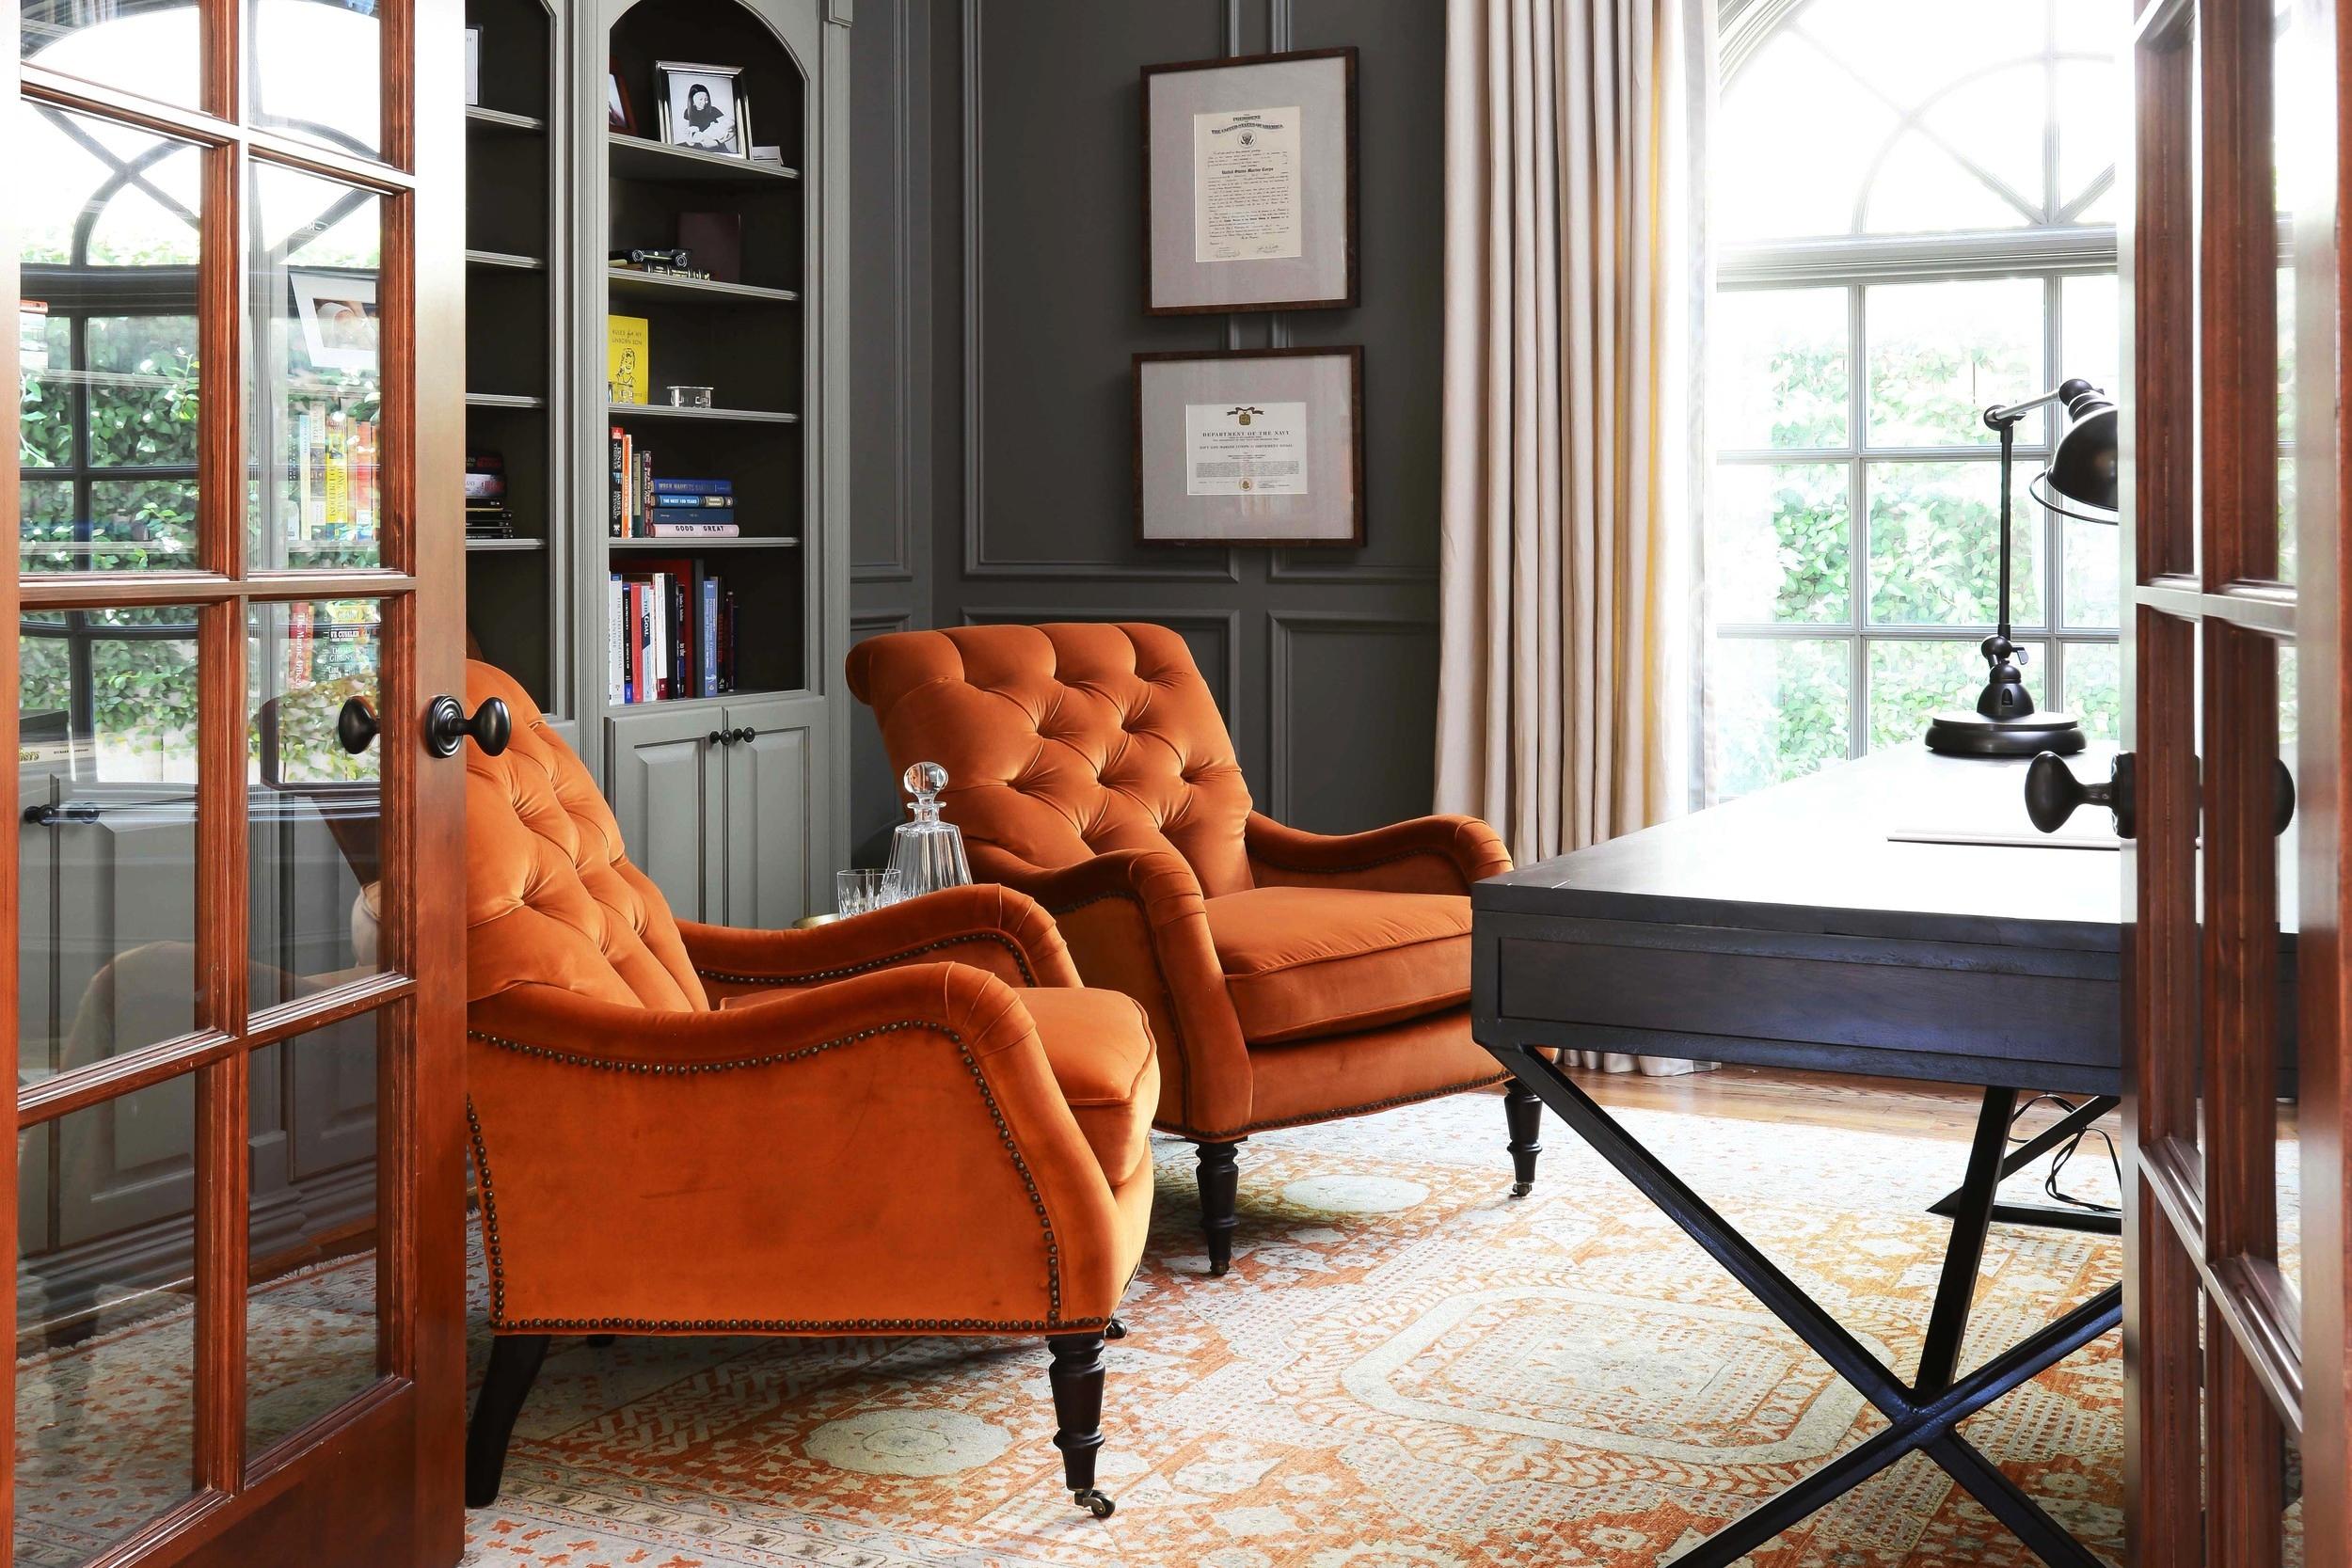 orange chairs cropped2.jpg